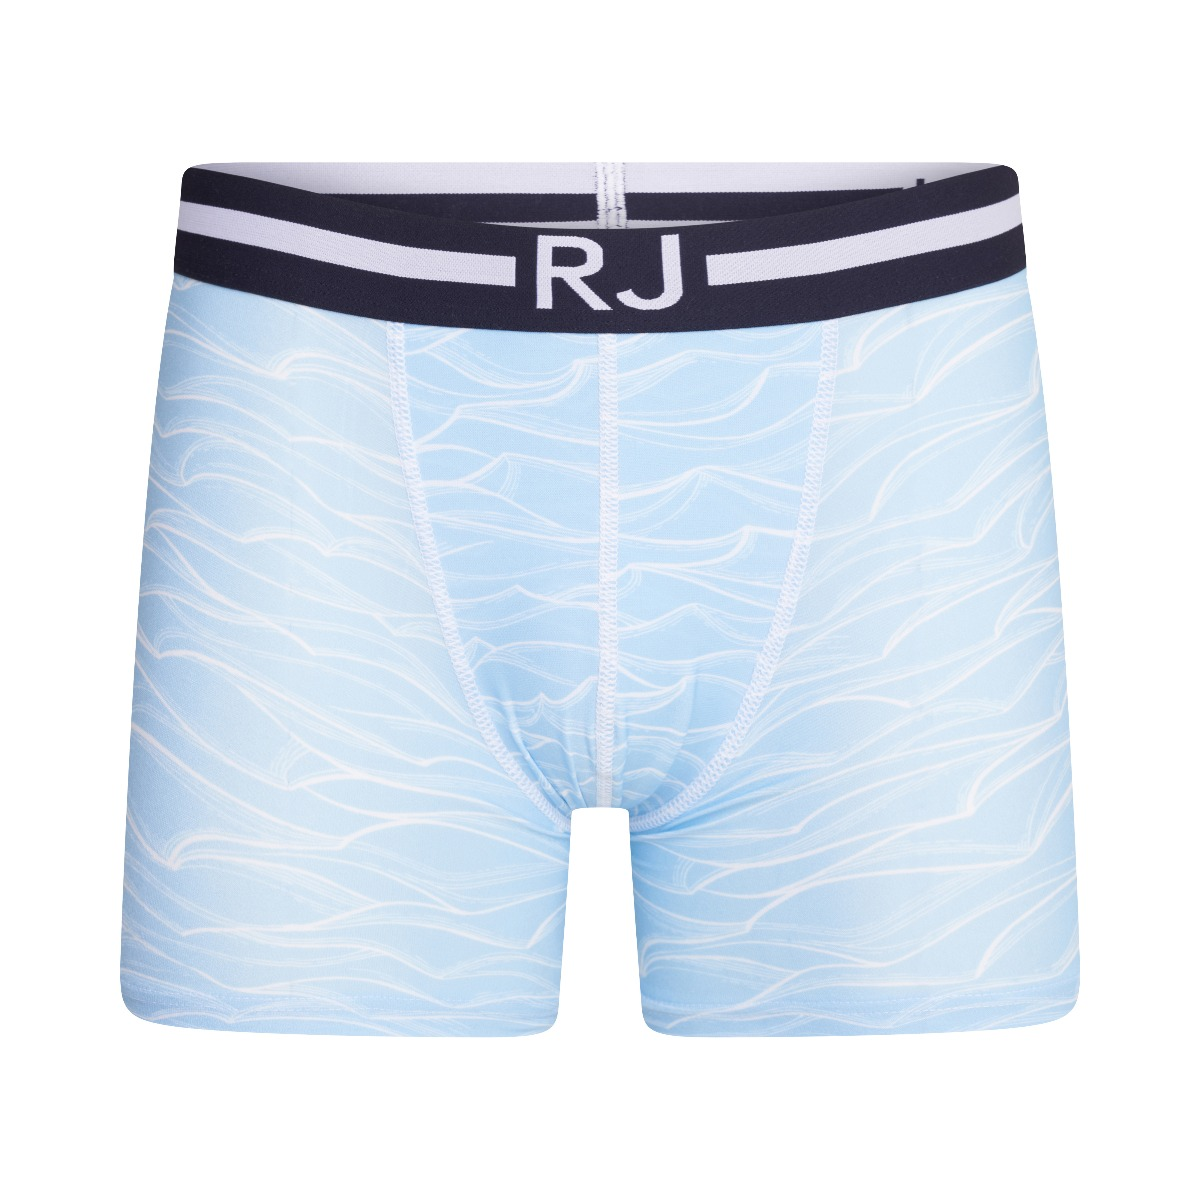 RJ Pure Fashion Heren Boxershort Sea XL